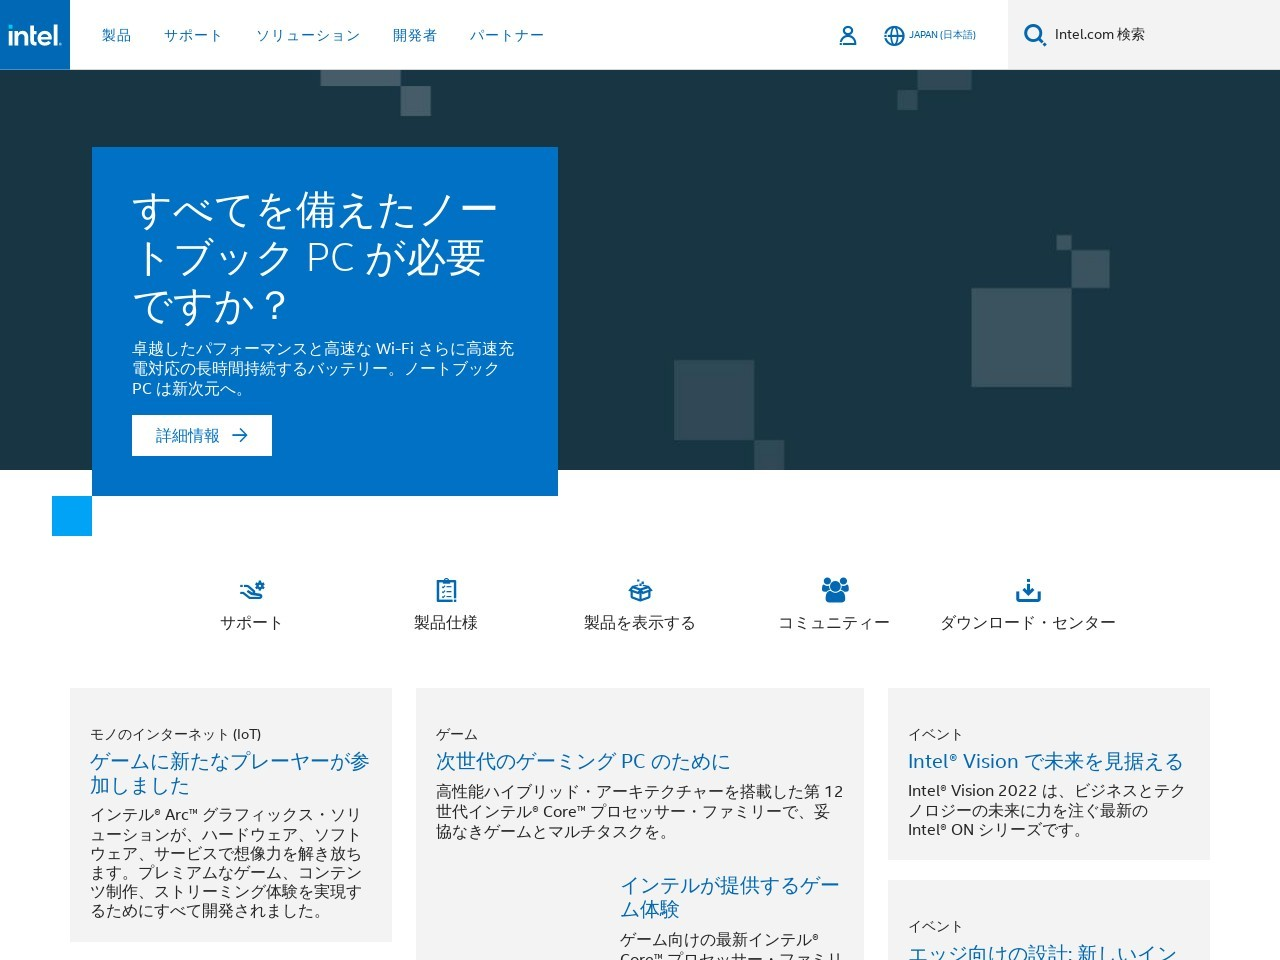 http://www.intel.co.jp/content/www/jp/ja/processors/core/core-i7-processor.html